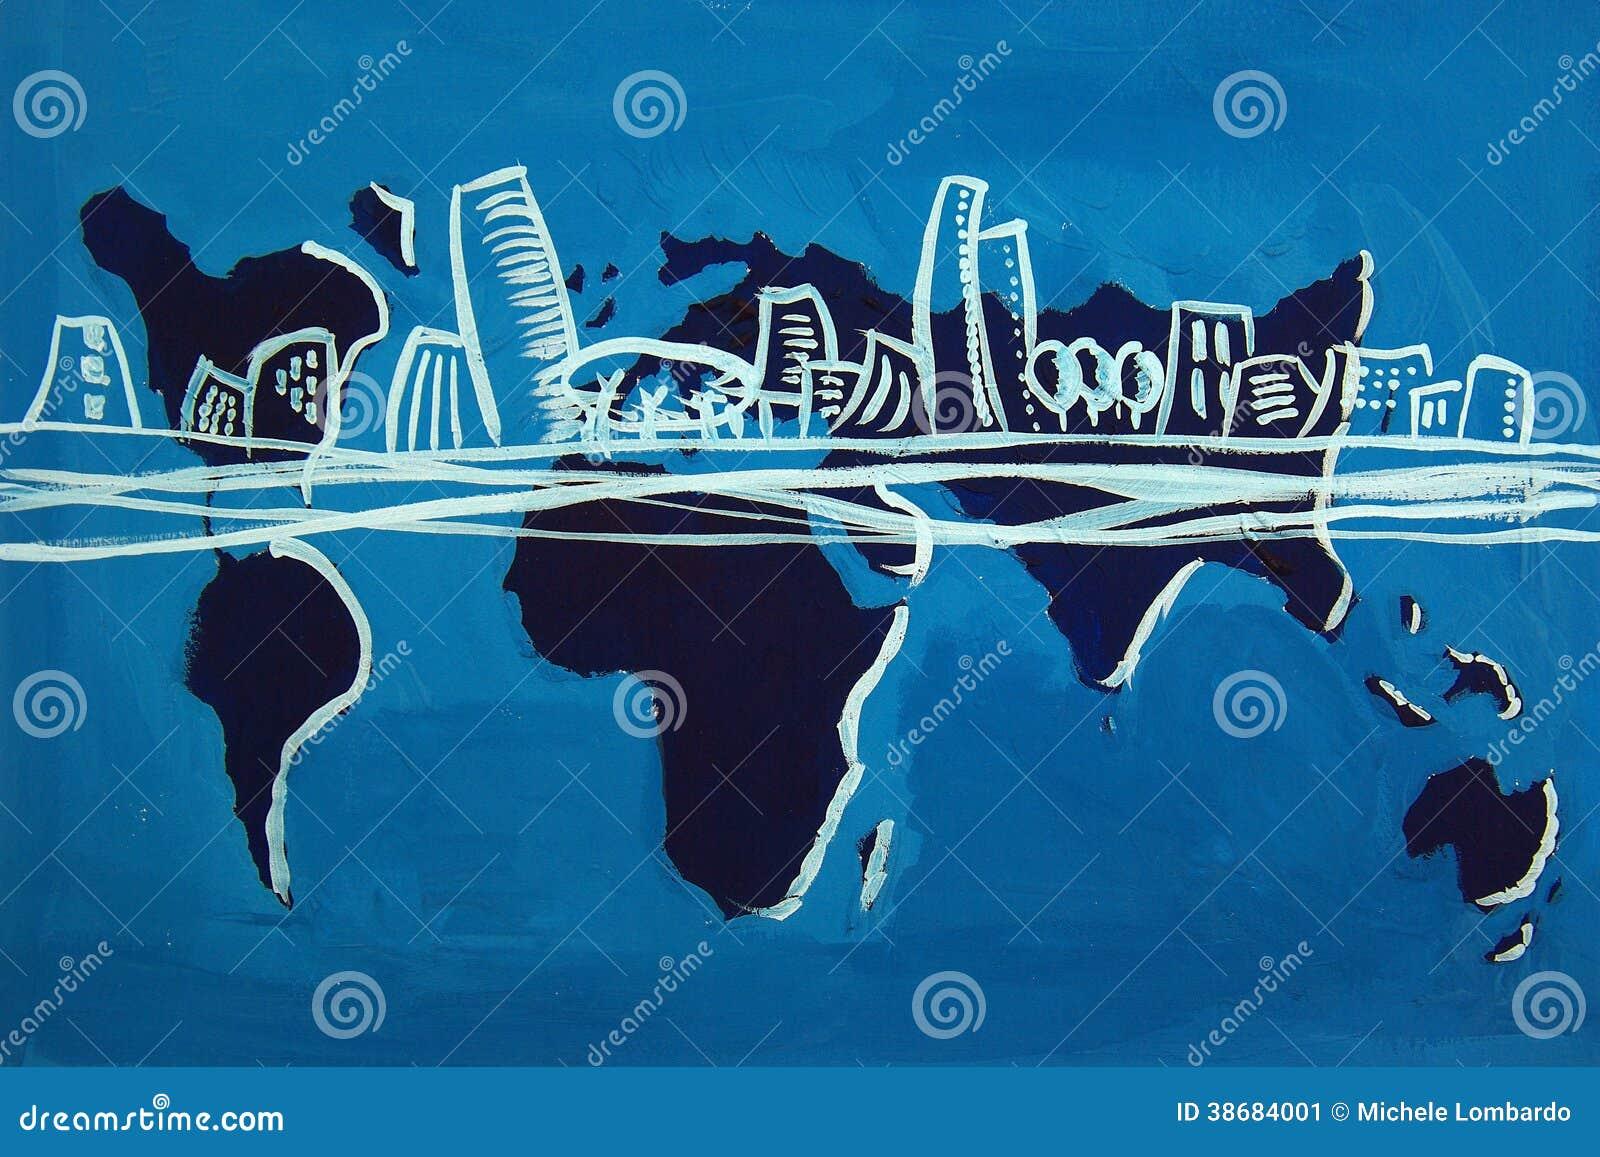 Die fünf Kontinente